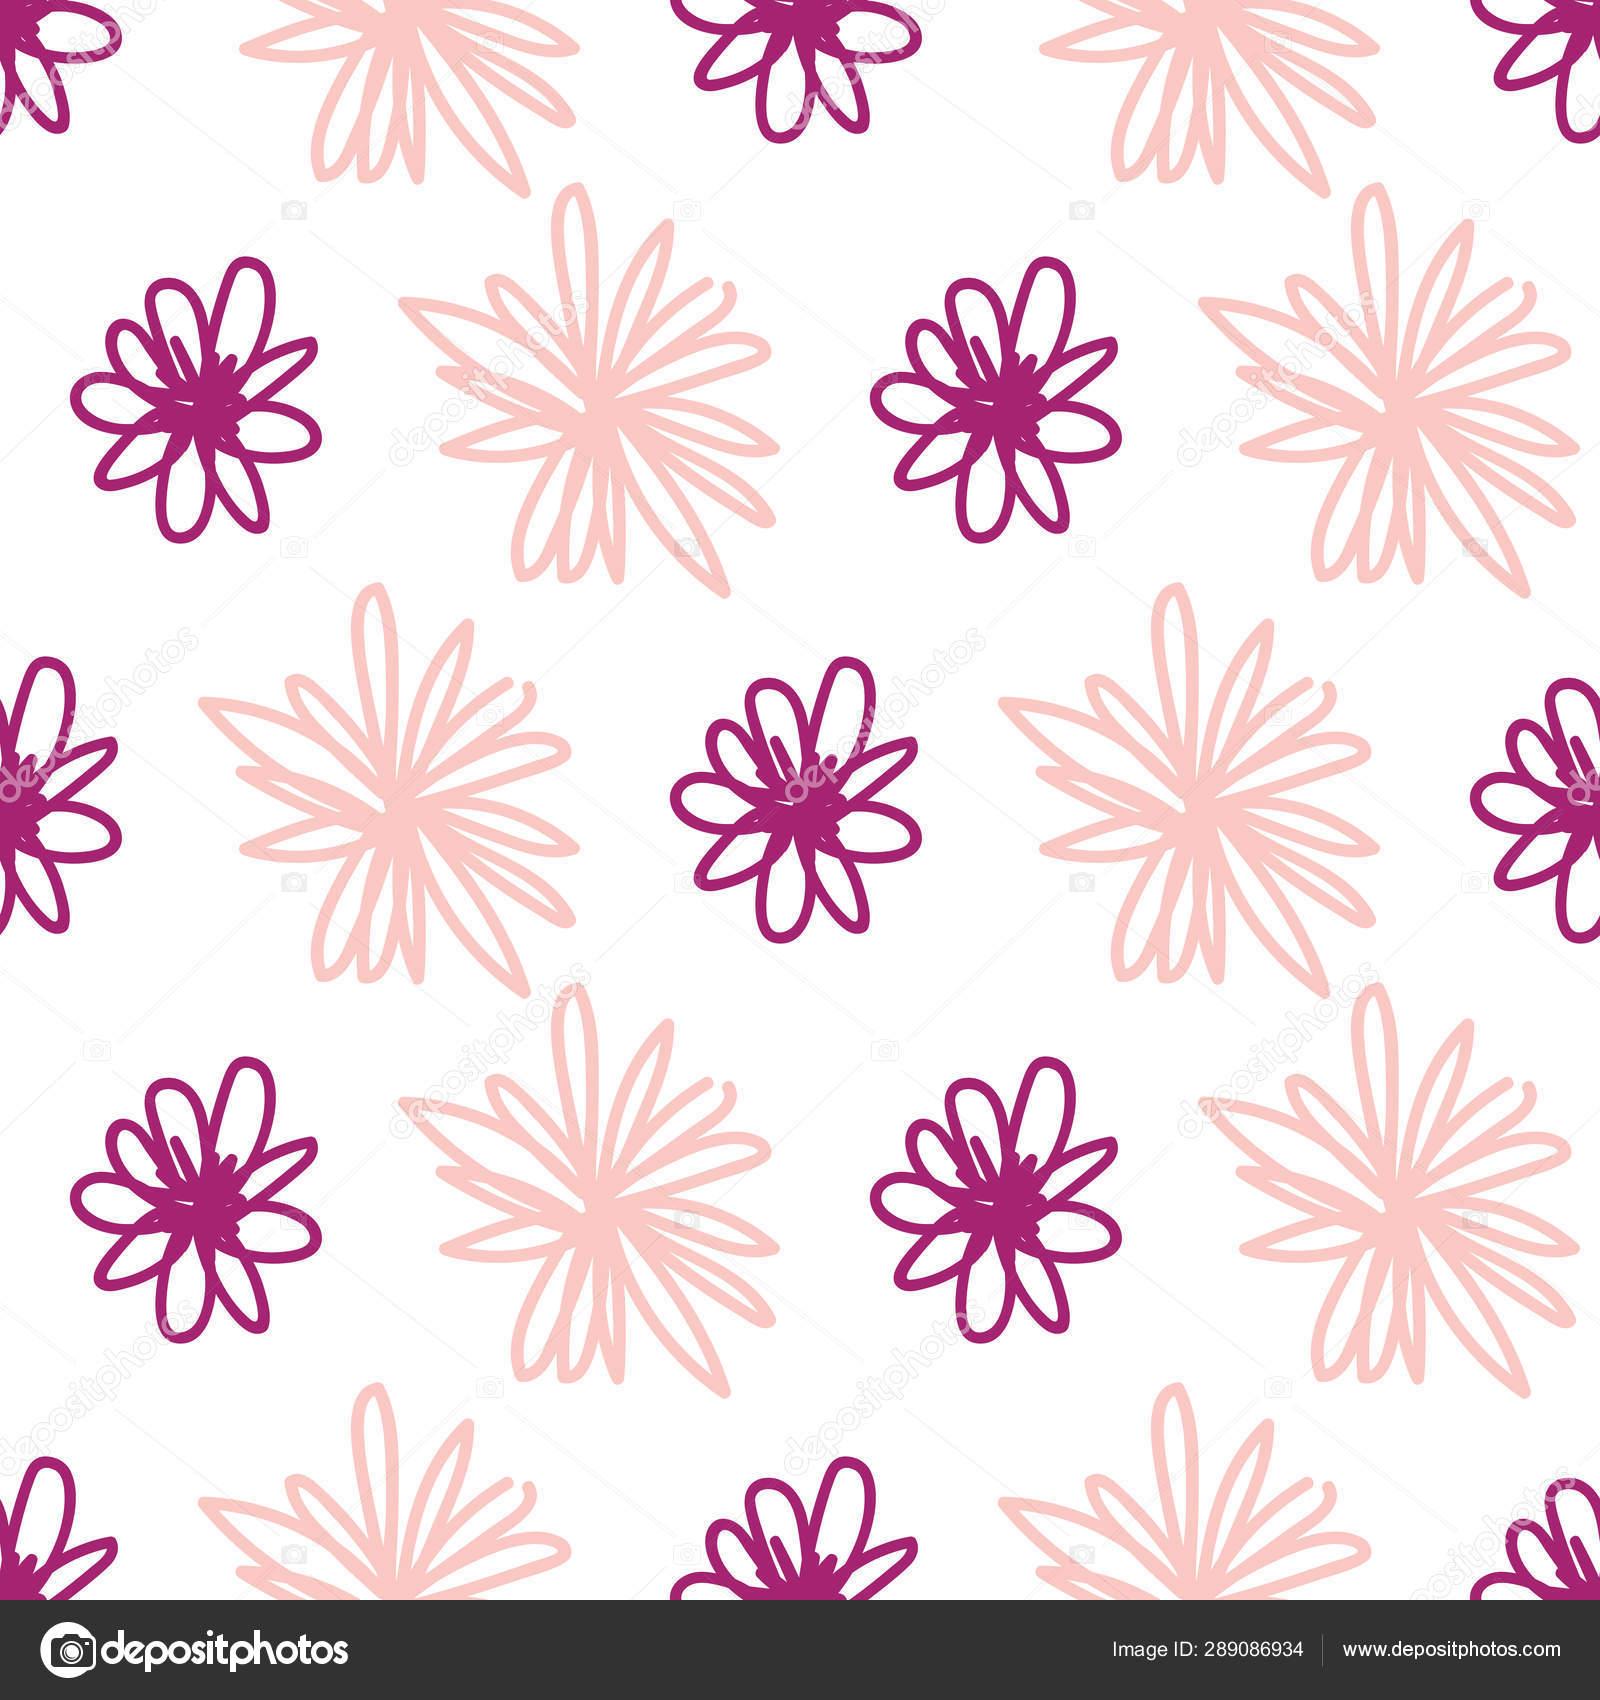 Wild Cute Girly Spring Summer Pink Flowers Seamless Pattern